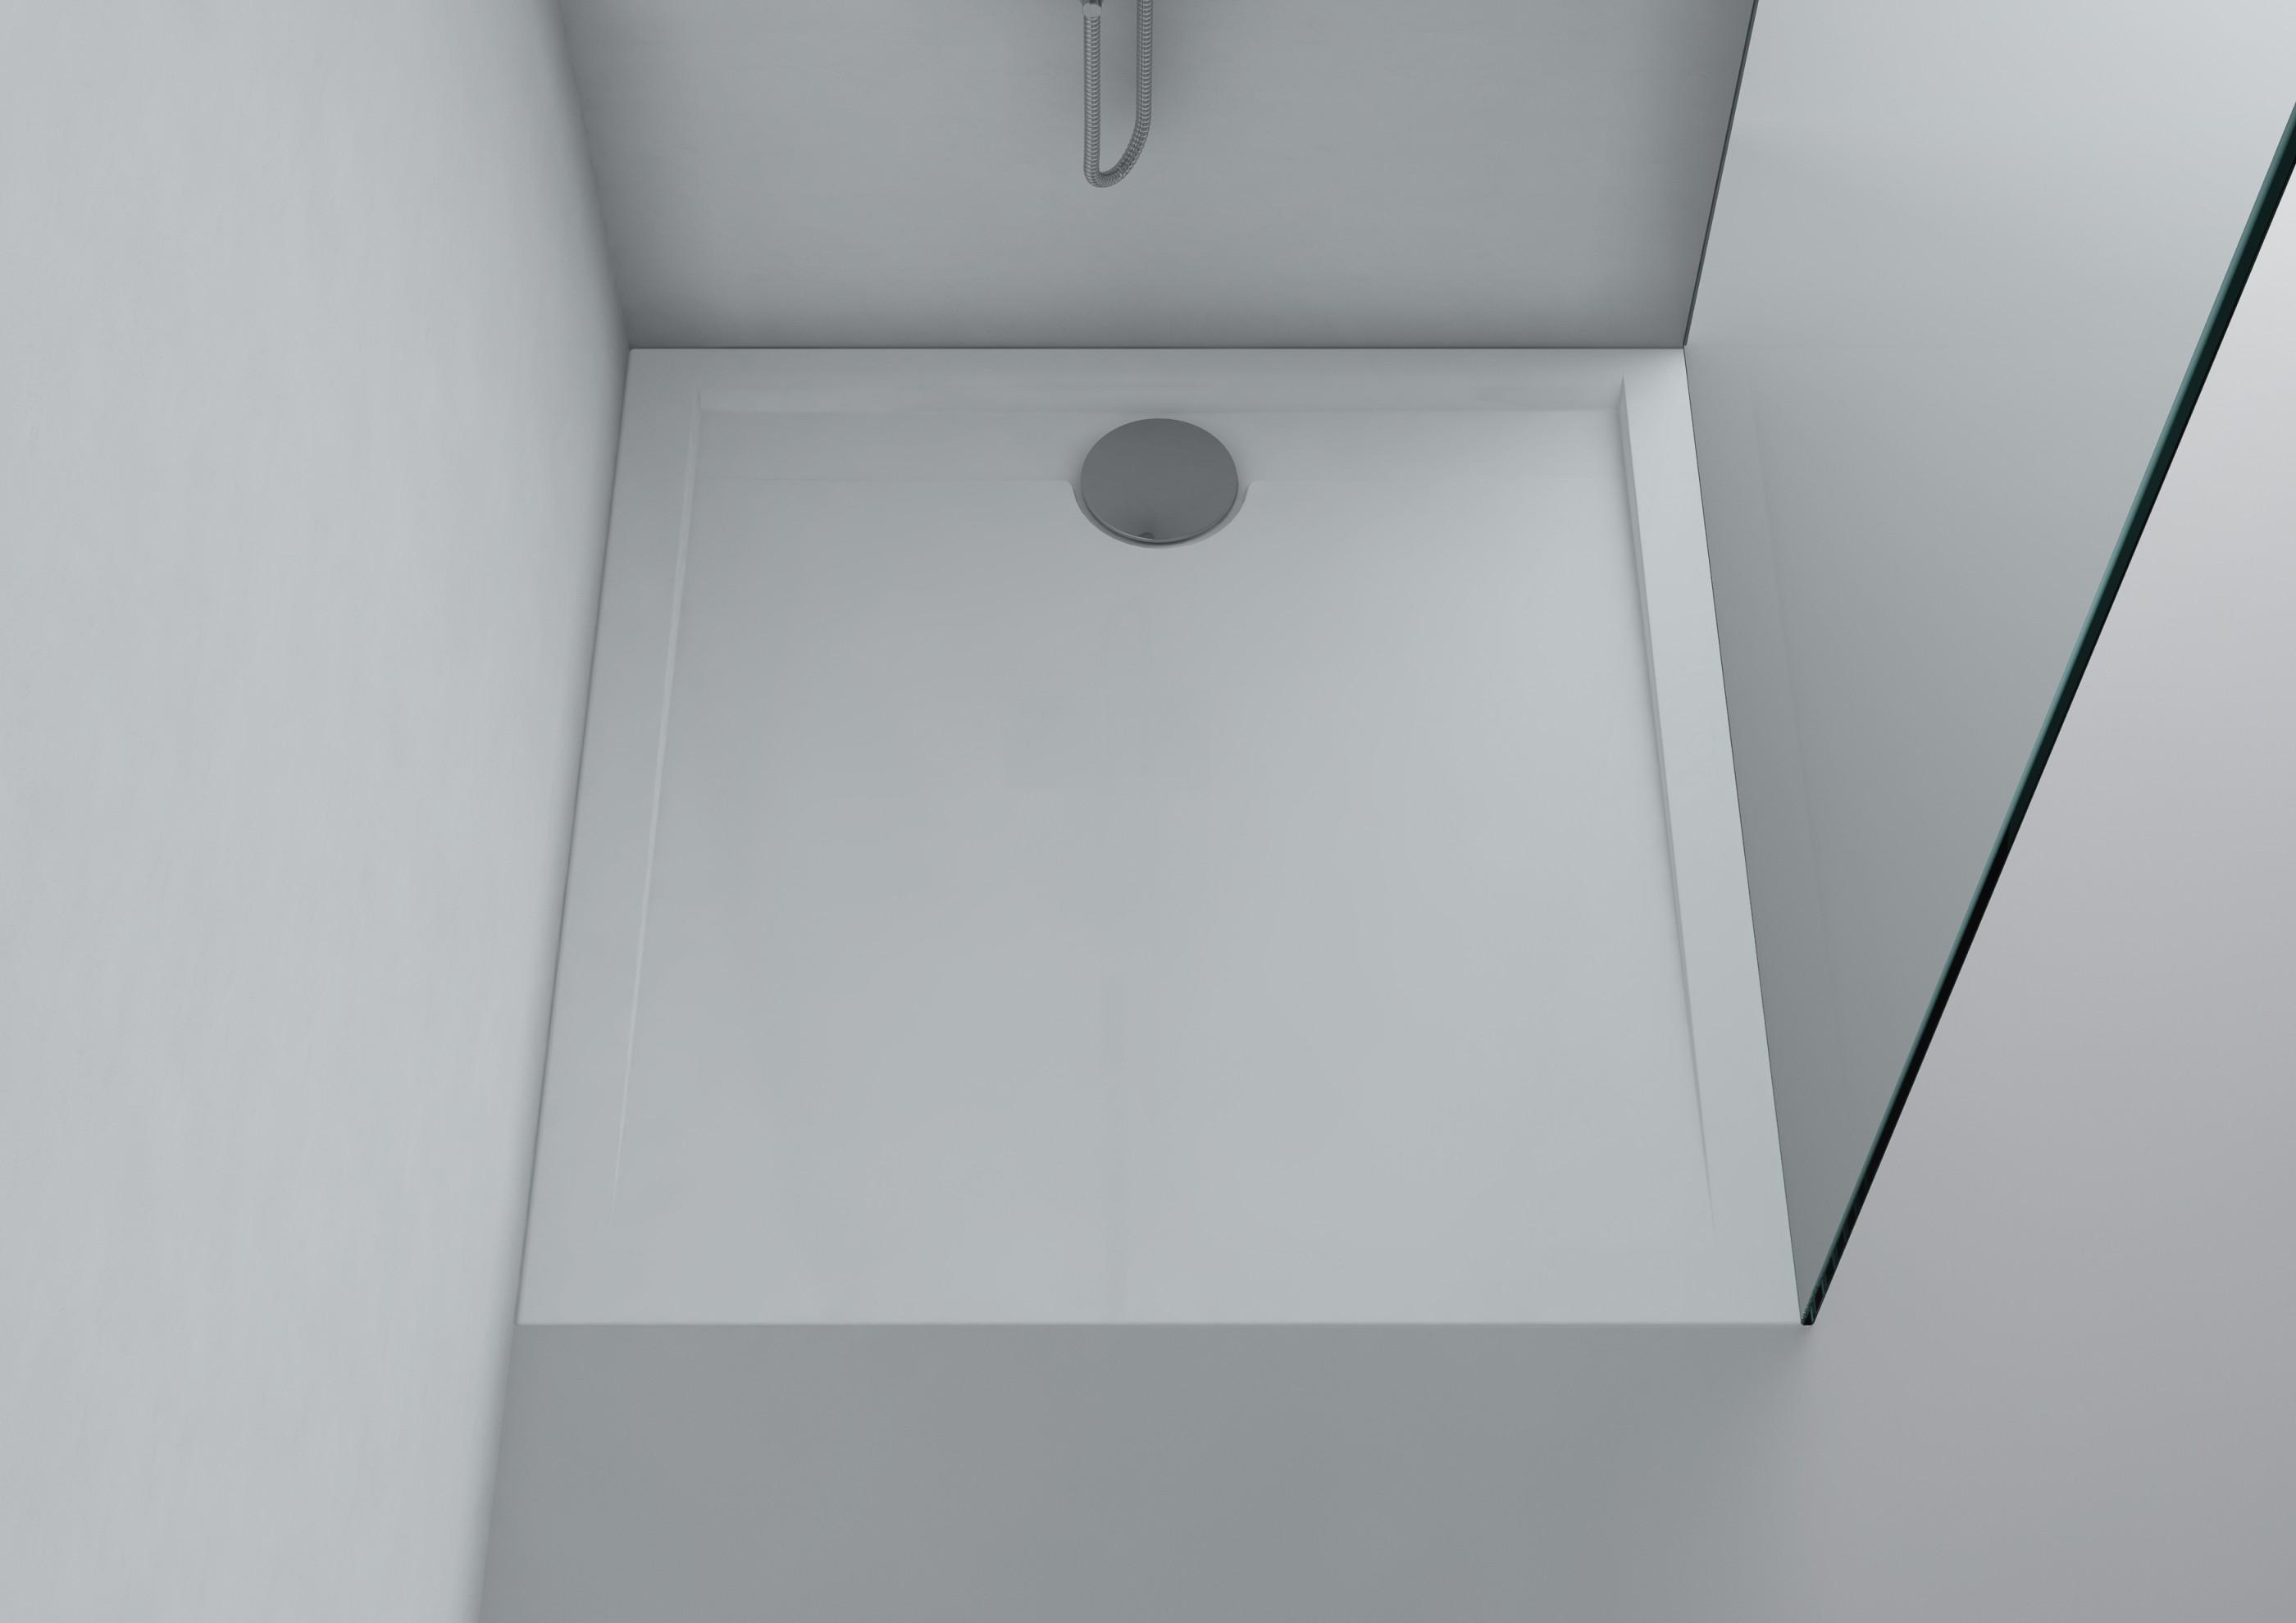 duschtasse bodengleich duschwanne bodengleich duschtasse. Black Bedroom Furniture Sets. Home Design Ideas